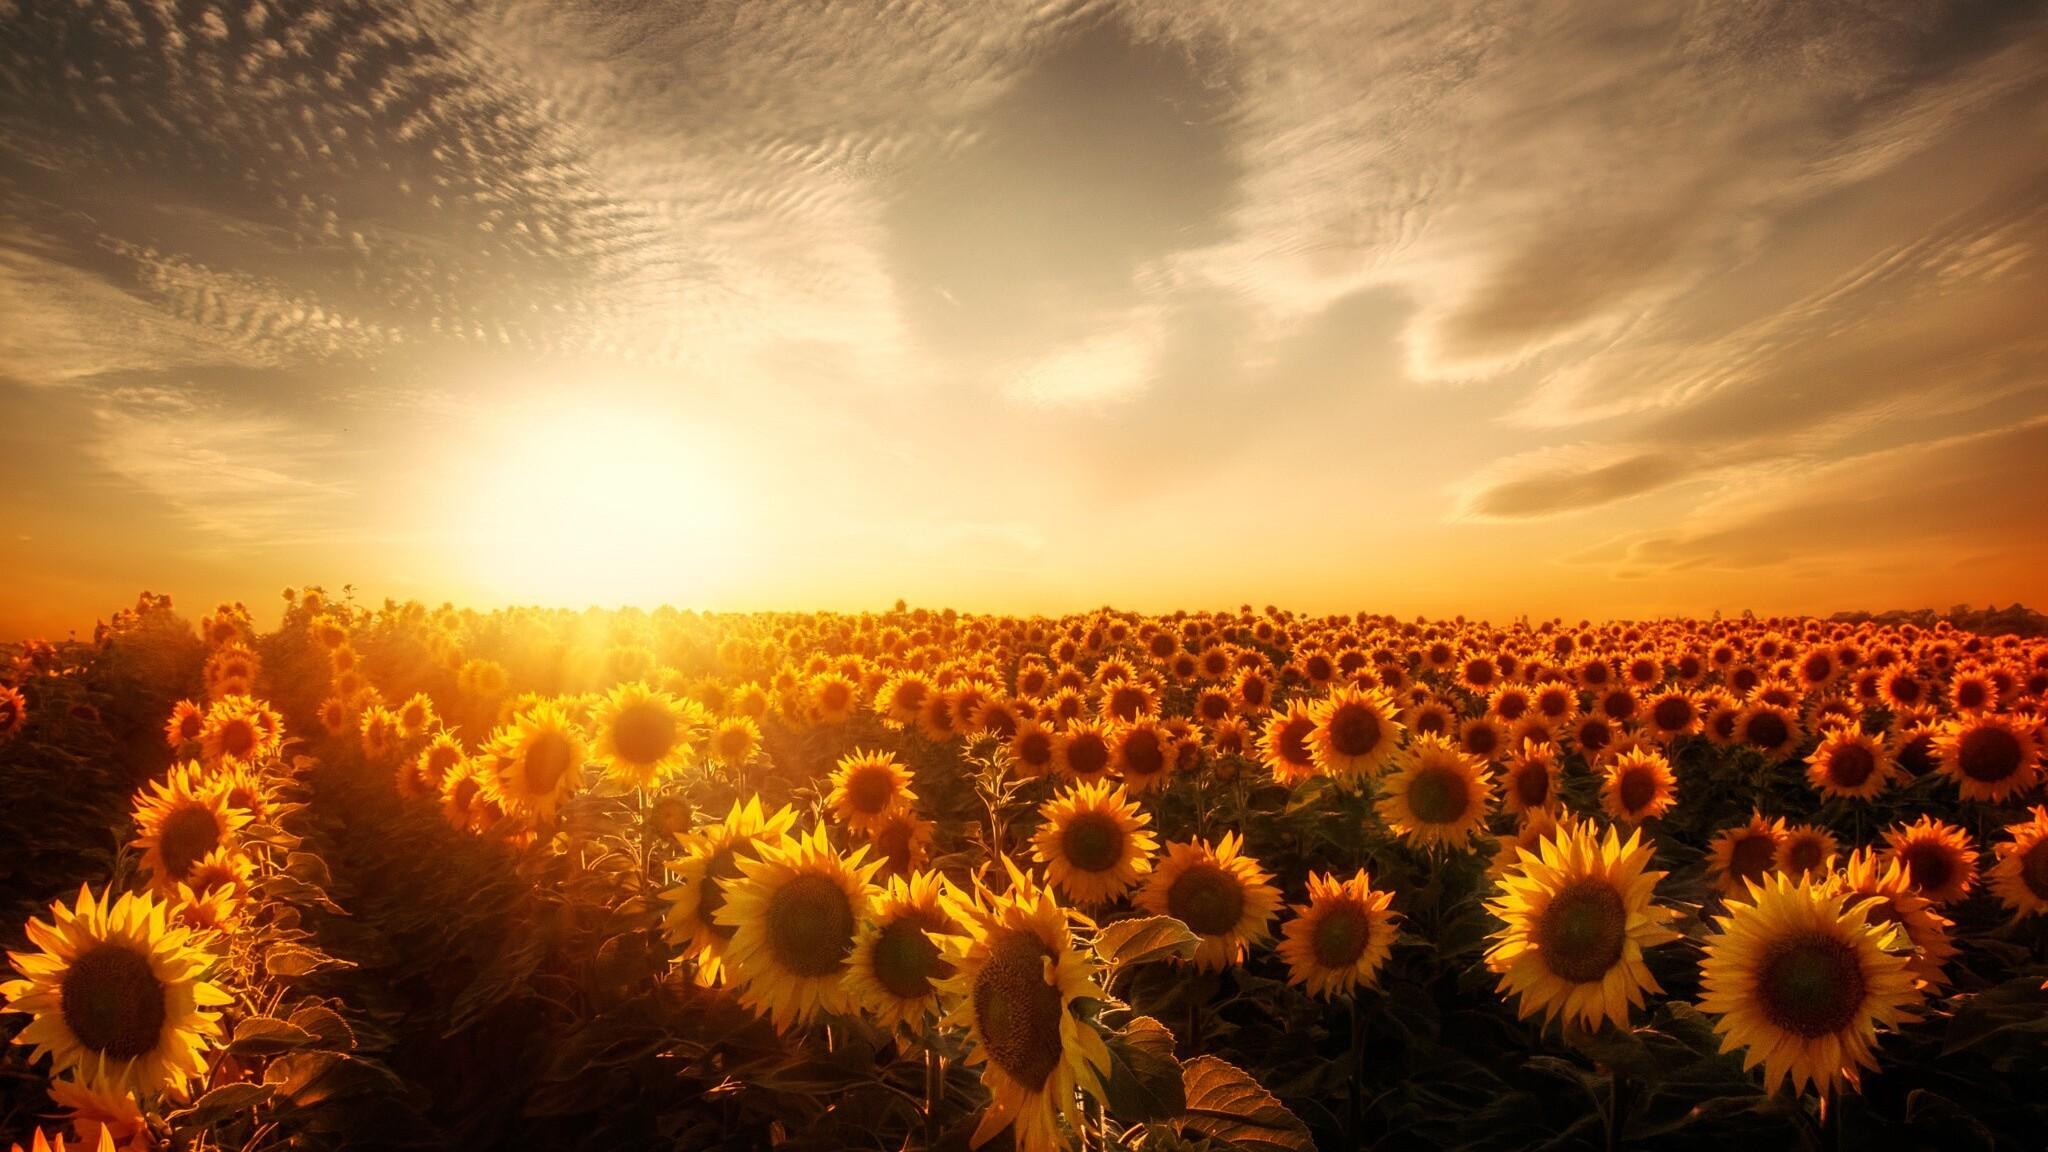 2048x1152 Sunflowers Sunset 2048x1152 Resolution HD 4k ...